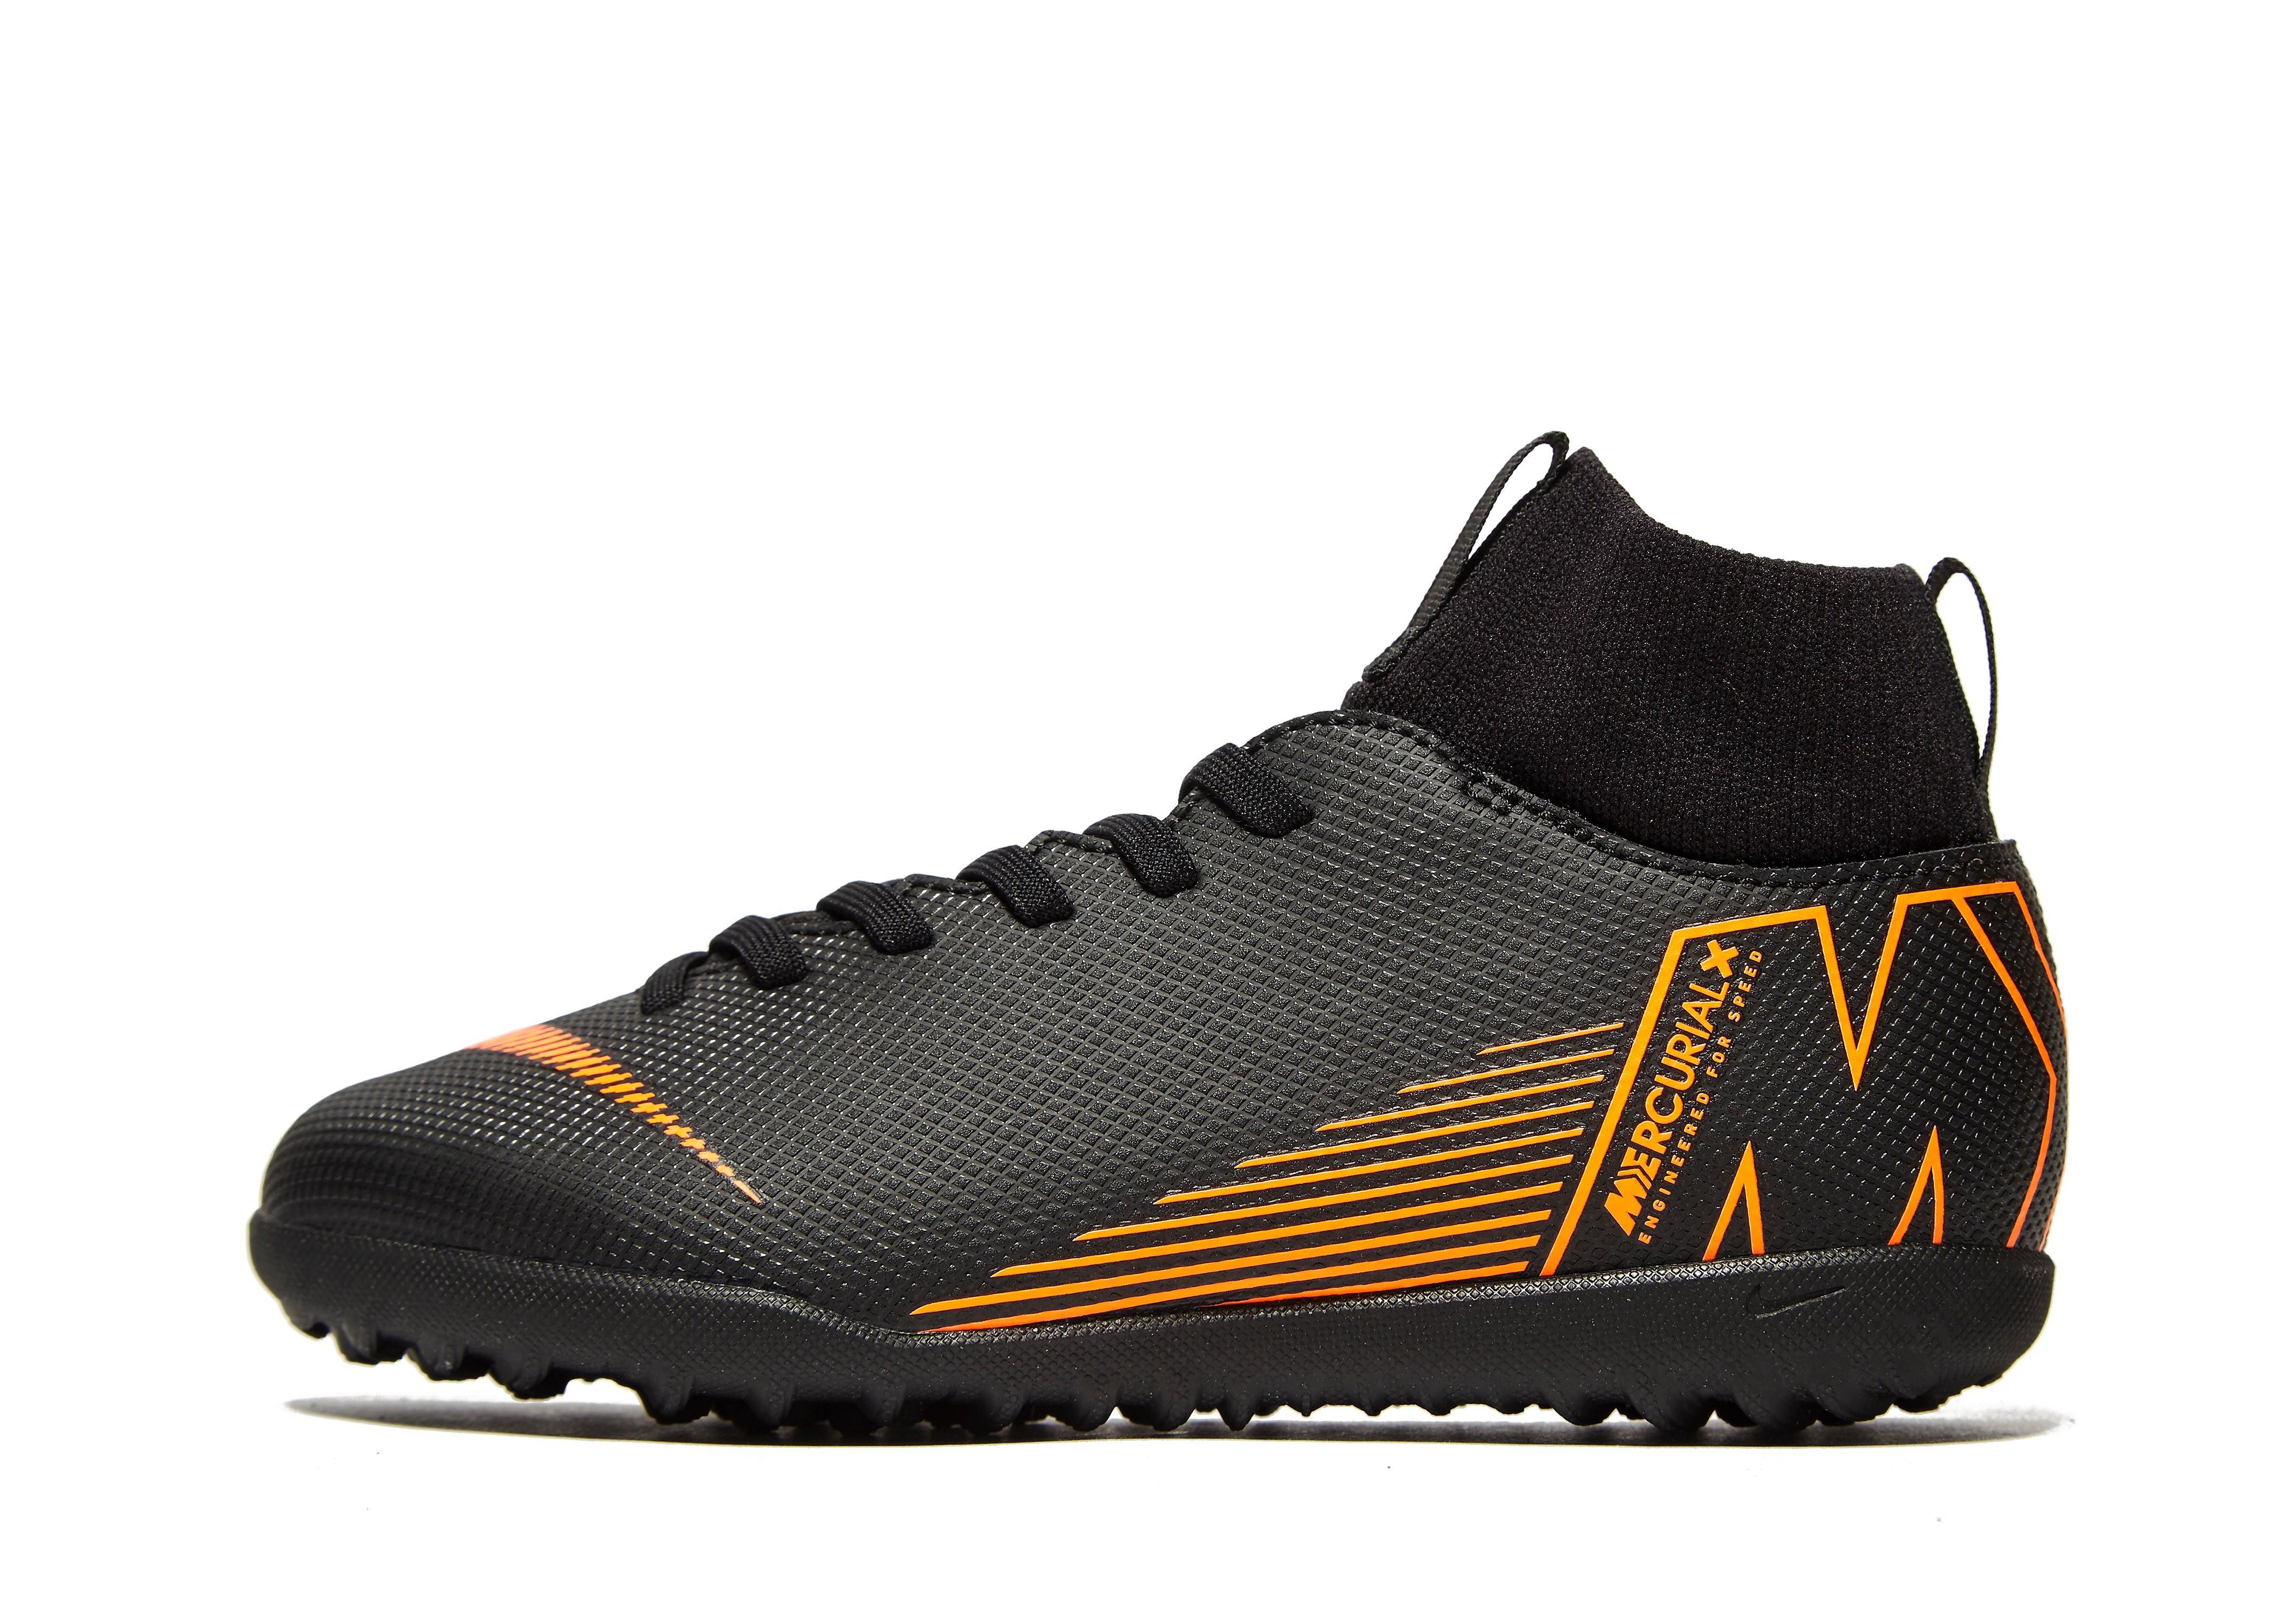 Nike Mercurial 360 Superfly TF Children